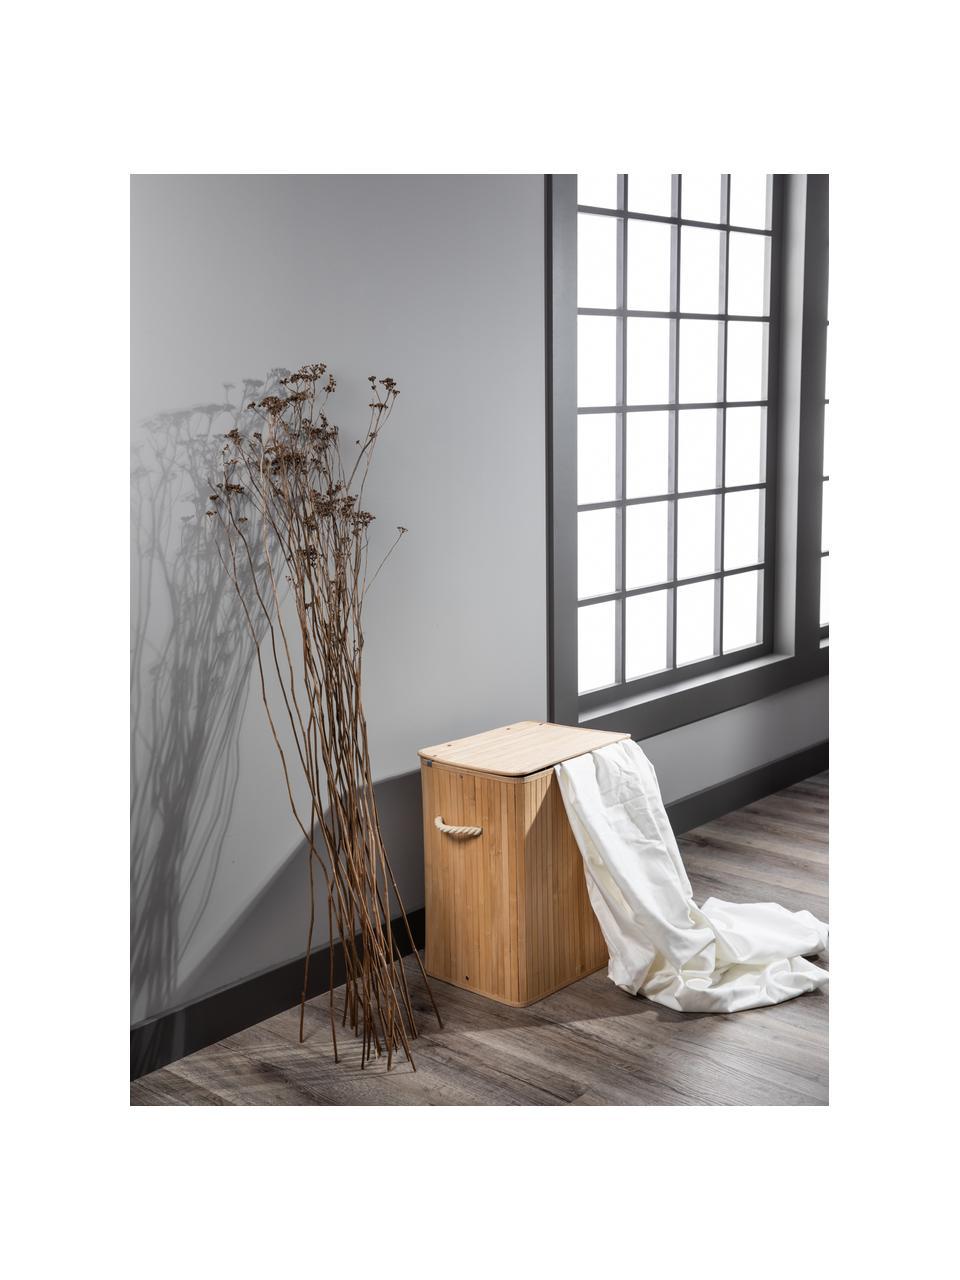 Wäschekorb Brimsdown, Korb: Bambus, Braun, 41 x 50 cm